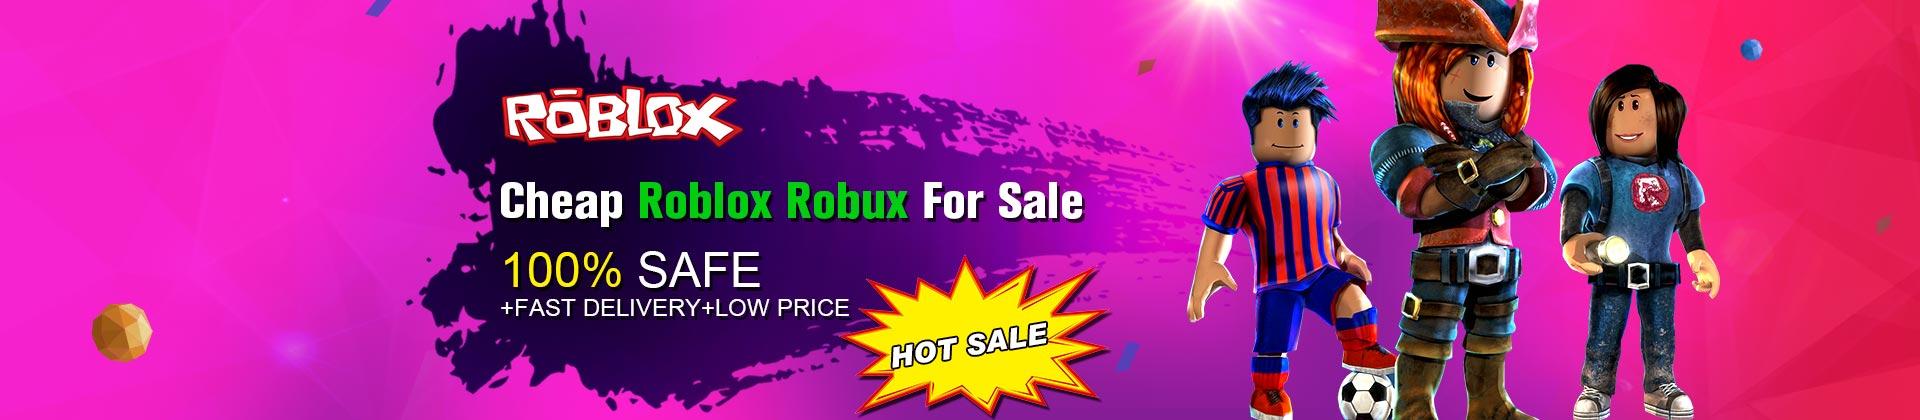 Cheap Robux